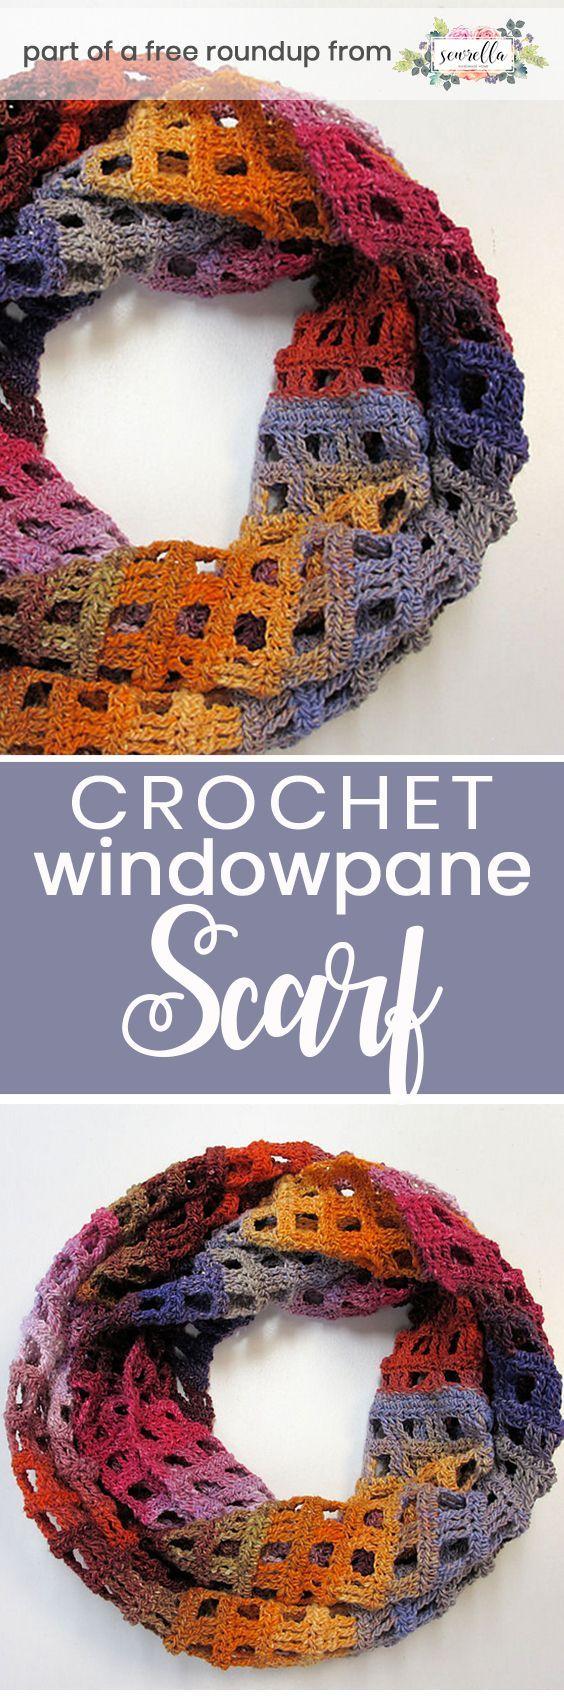 Repeat Crochet Me: Crochet this easy beginner friendly windowpane inf...